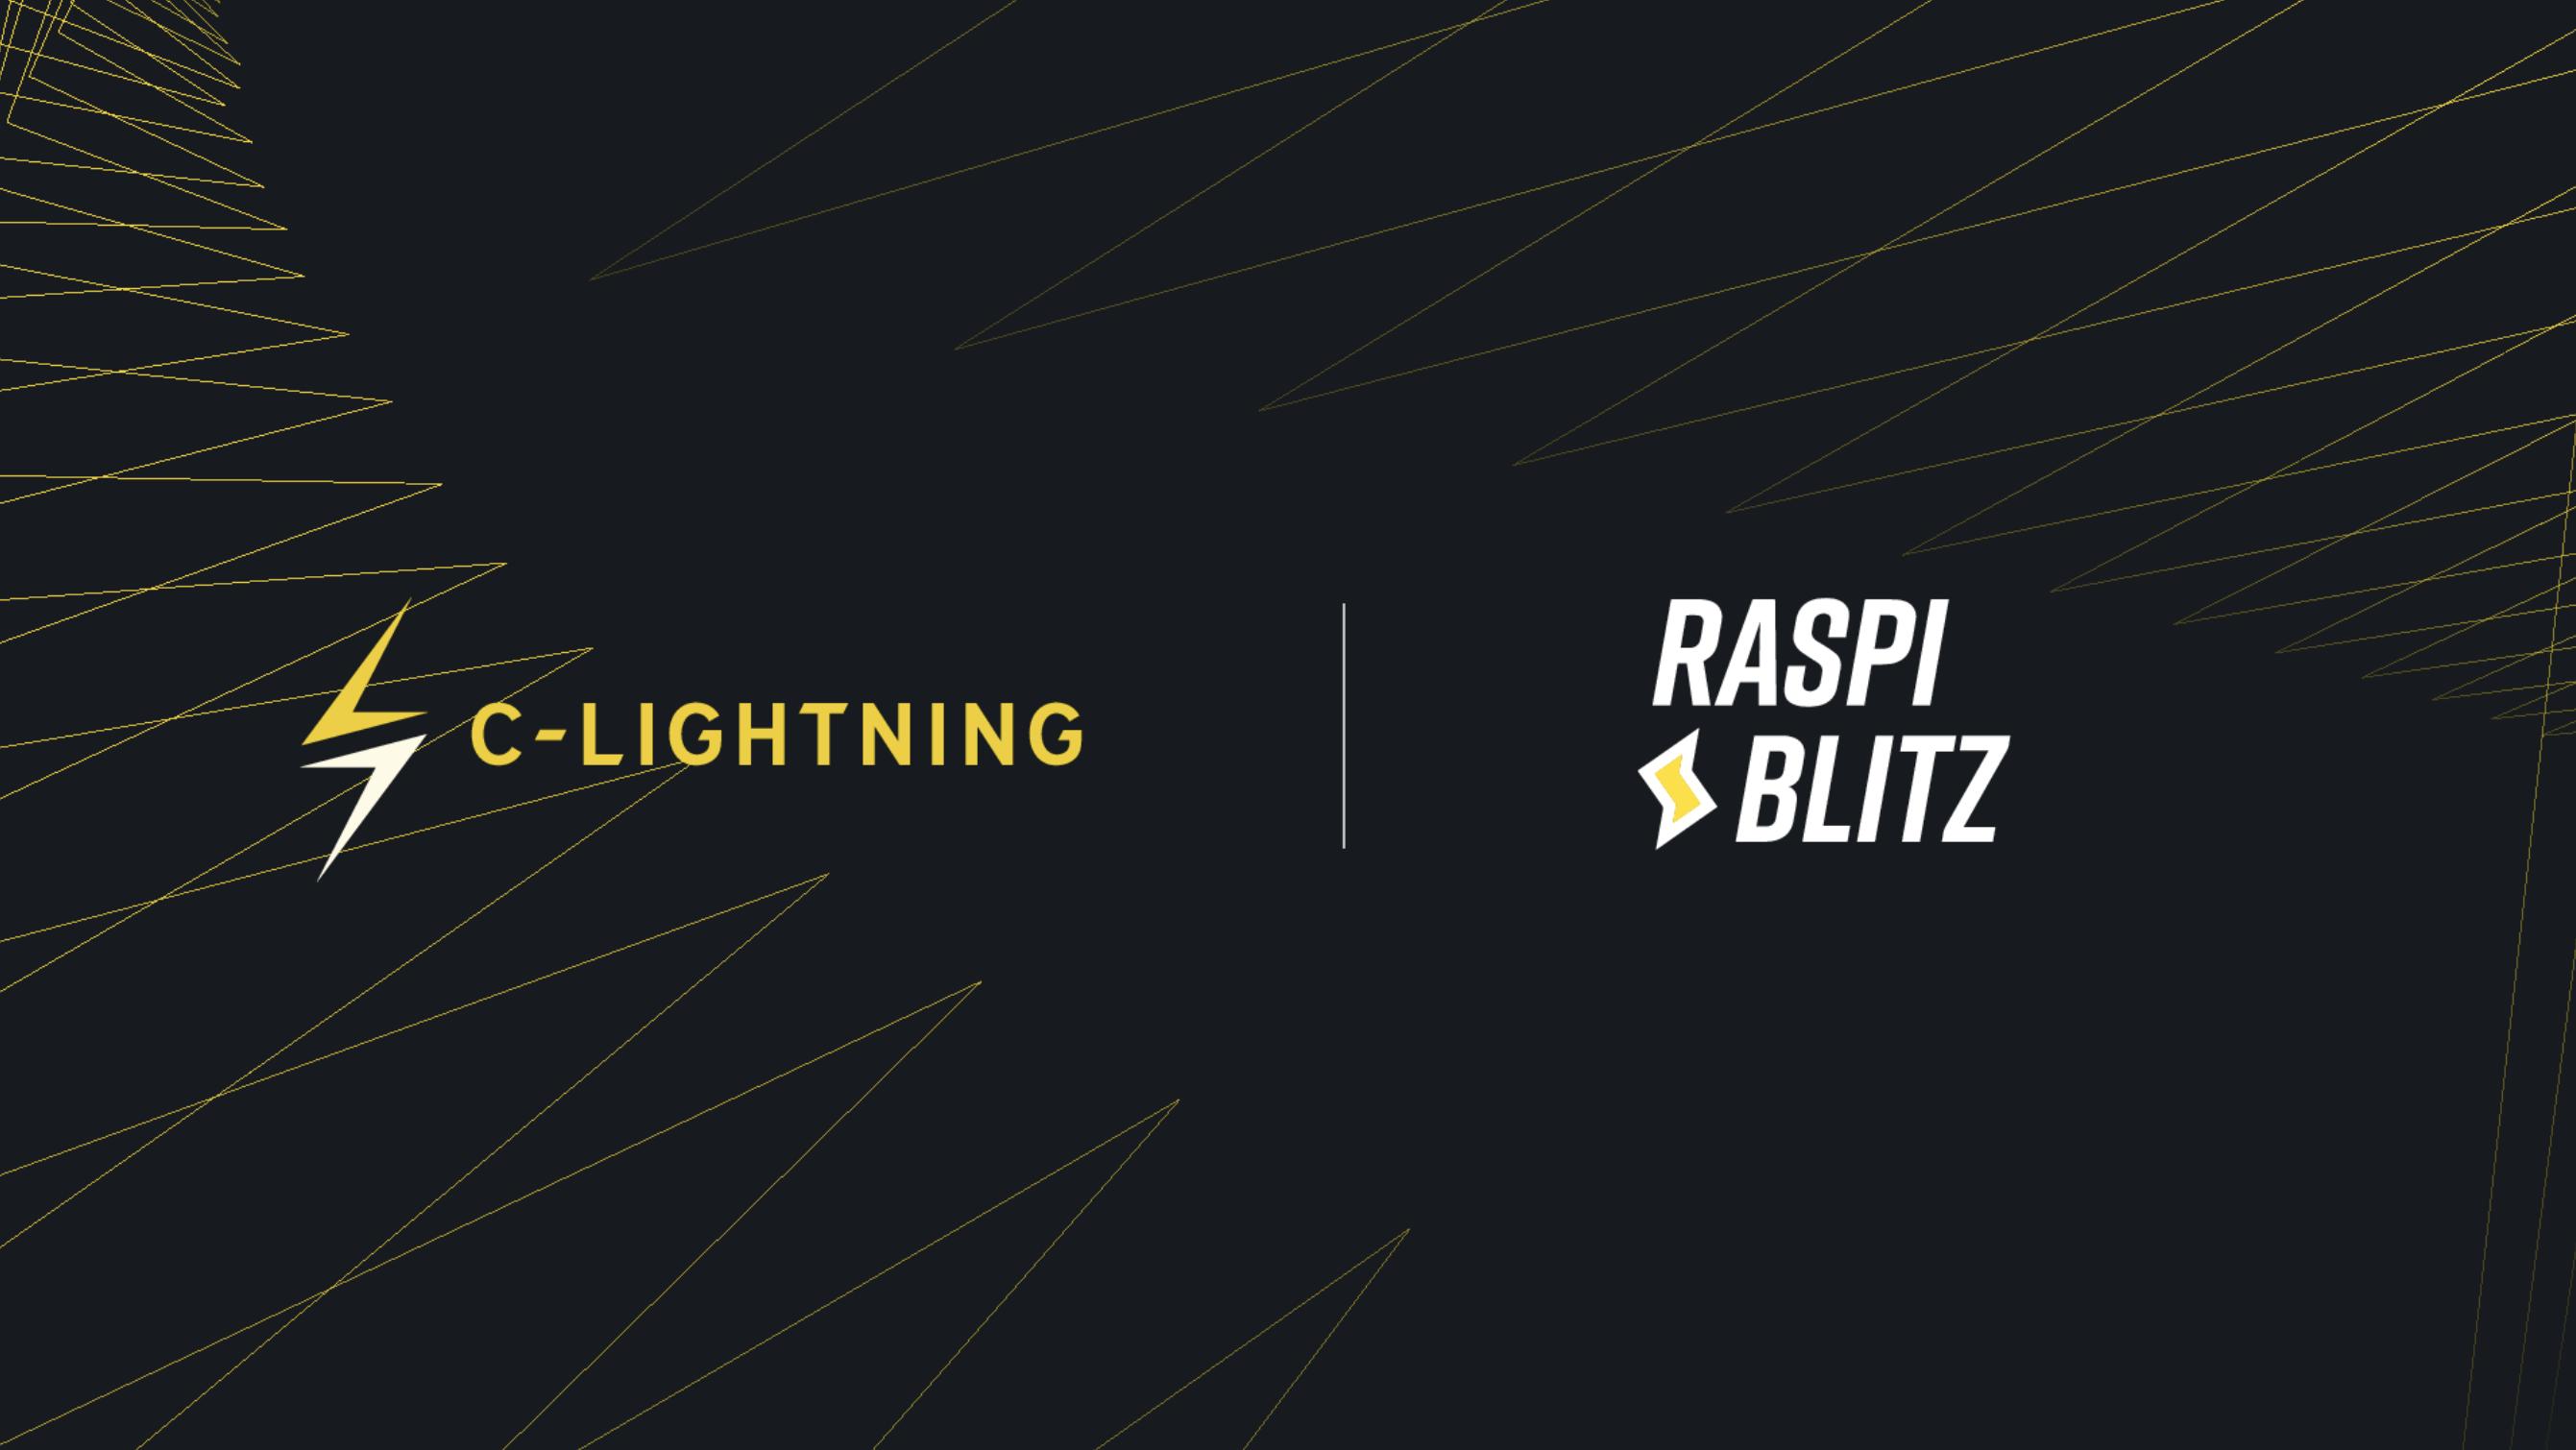 RaspiBlitz Integrates c-lightning for Lightweight, Customizable Functionality